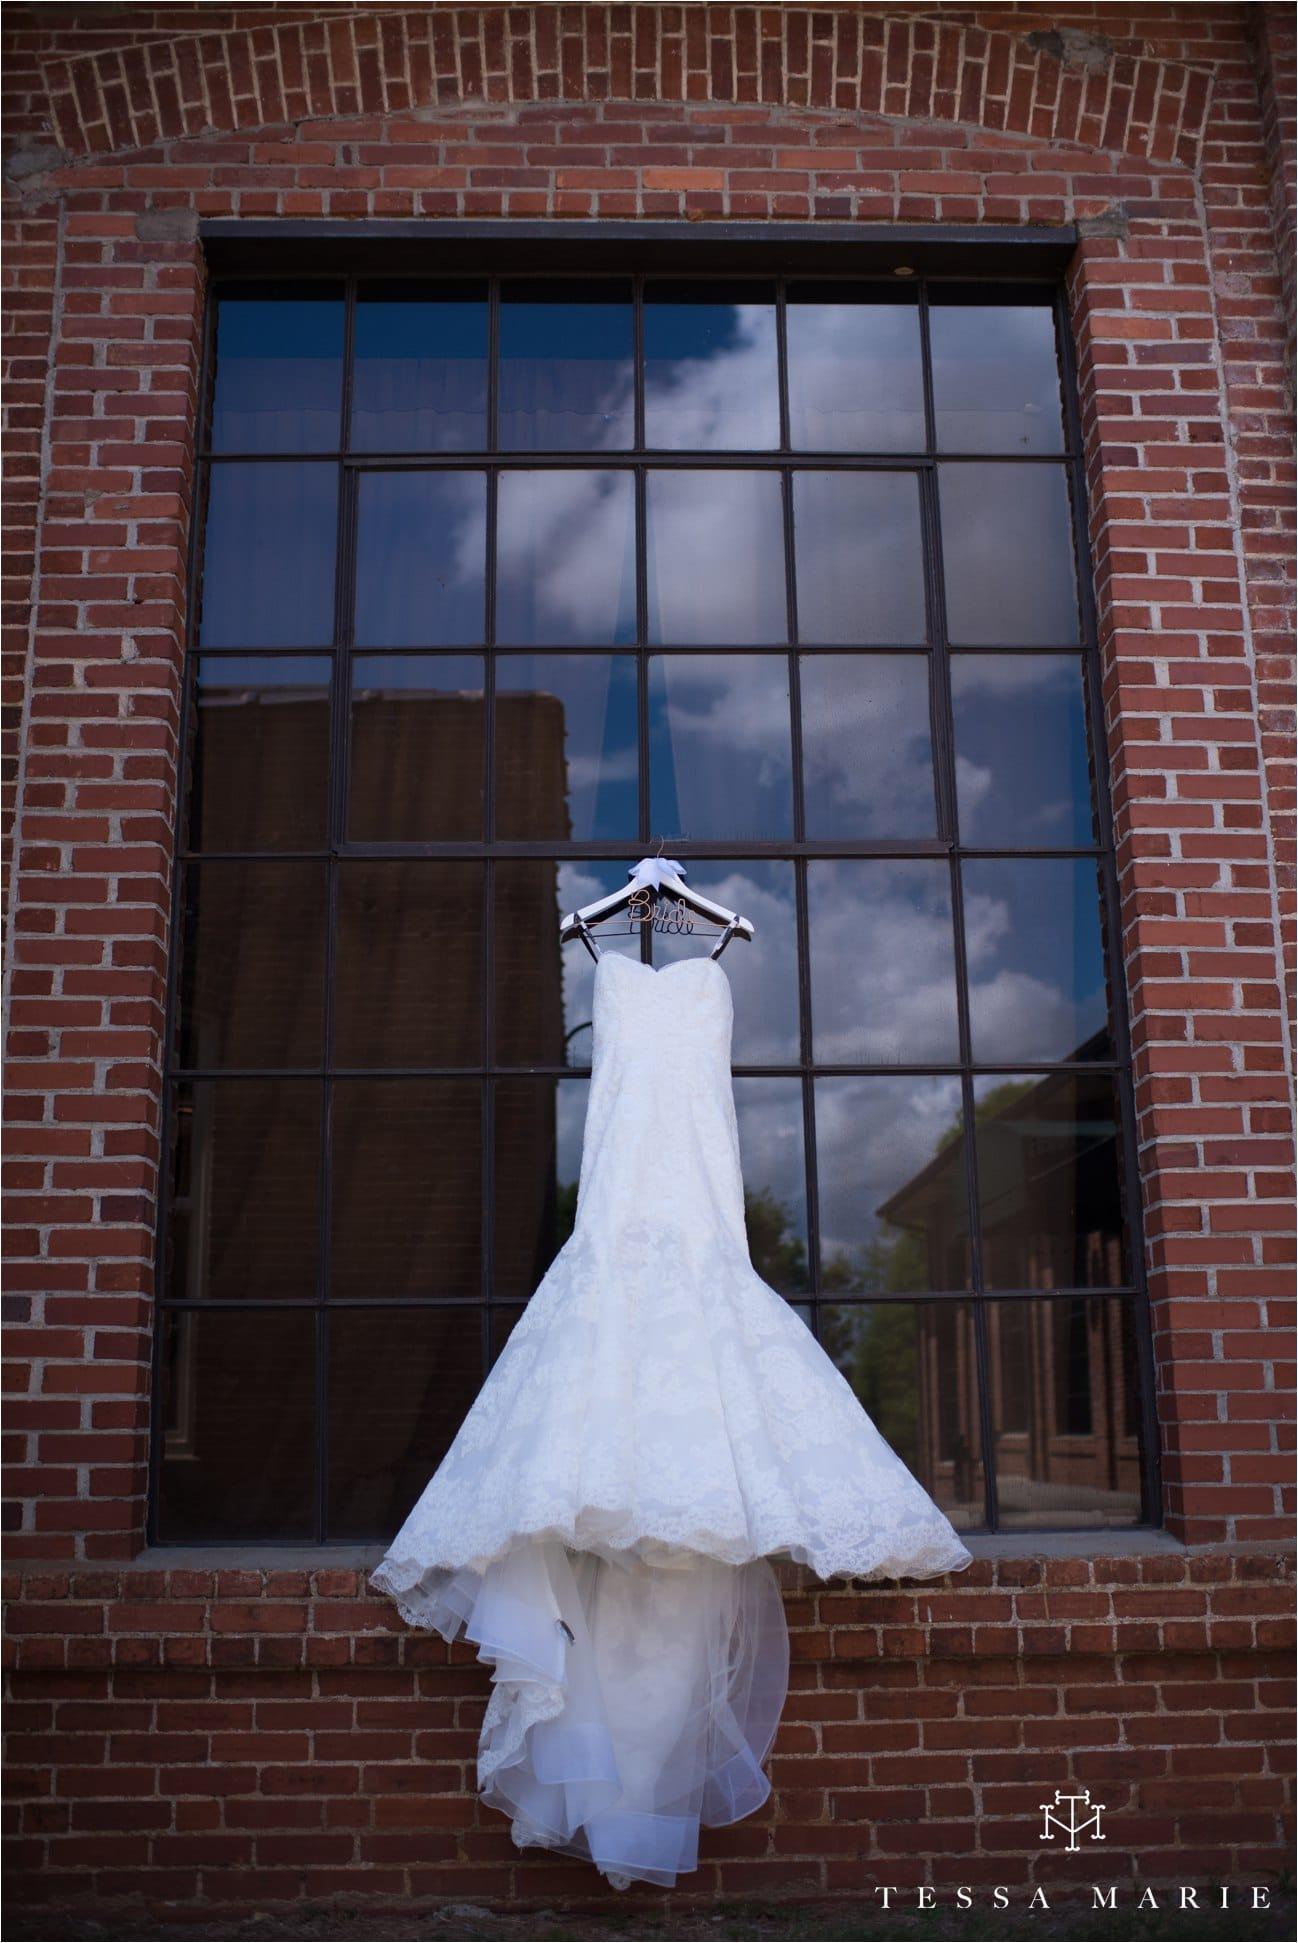 tessa_marie_weddings_rivermill_event_centere_candid_outdoor_wedding_photos_0007